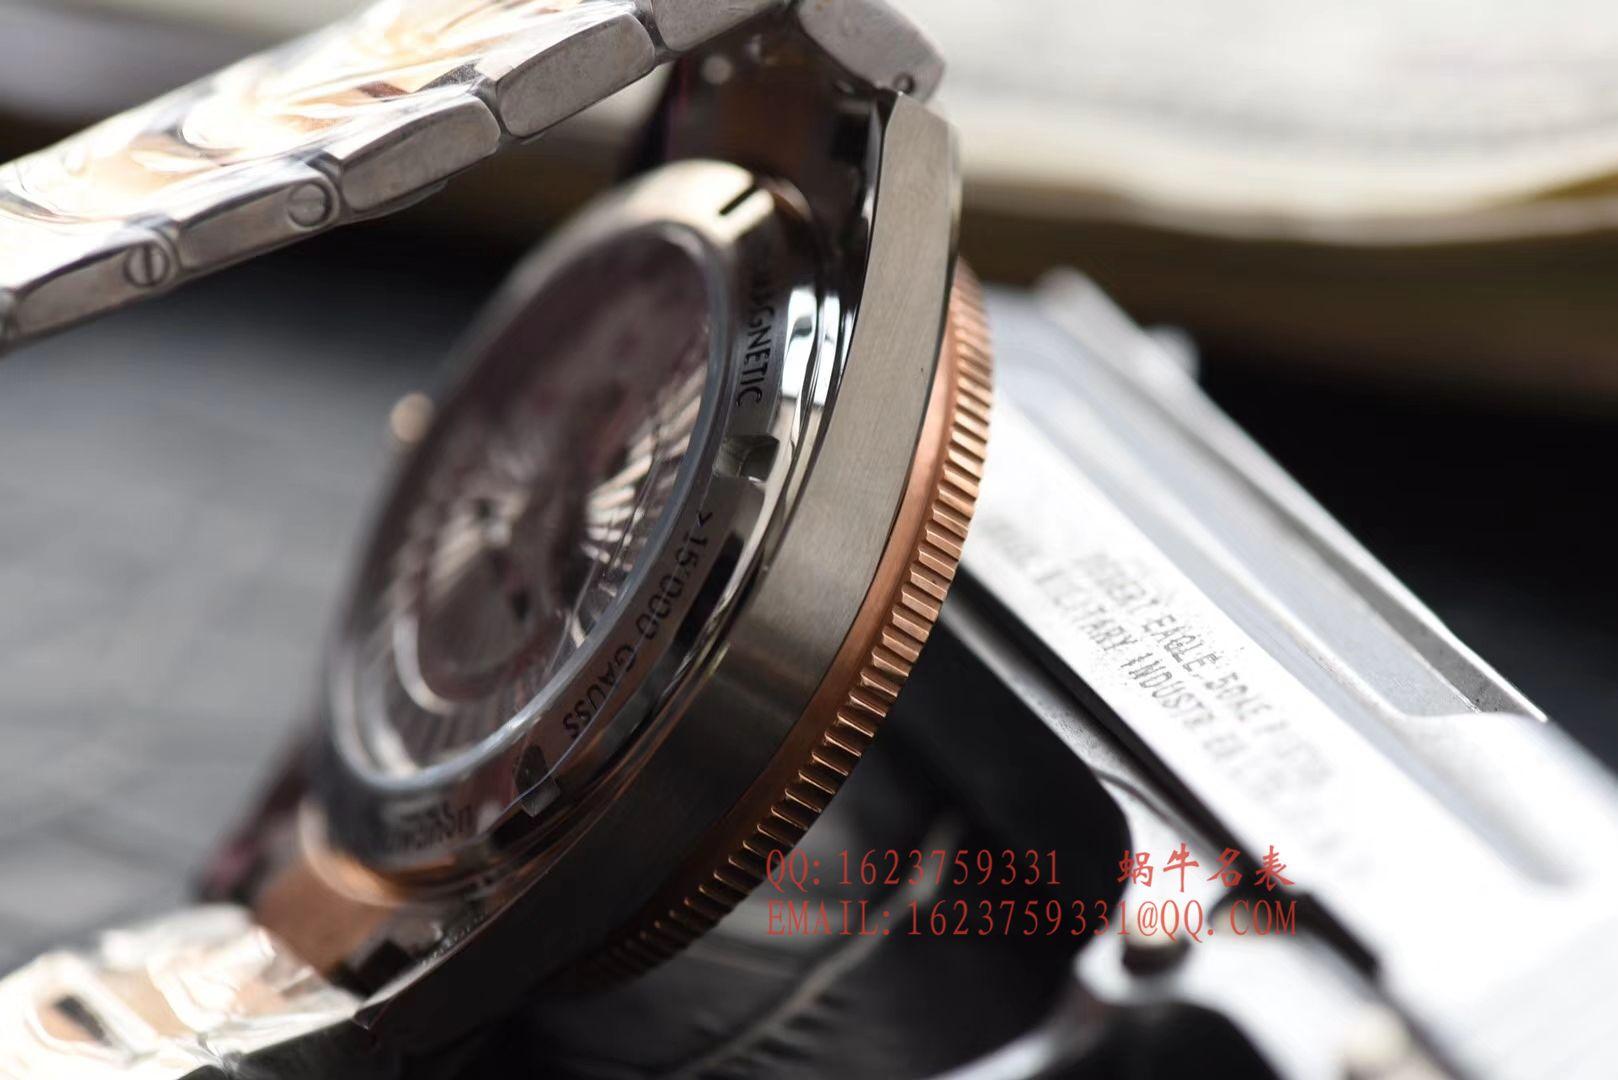 【XF一比一超A精仿手表】欧米茄海马300系列233.20.41.21.01.001腕表 / MAH184